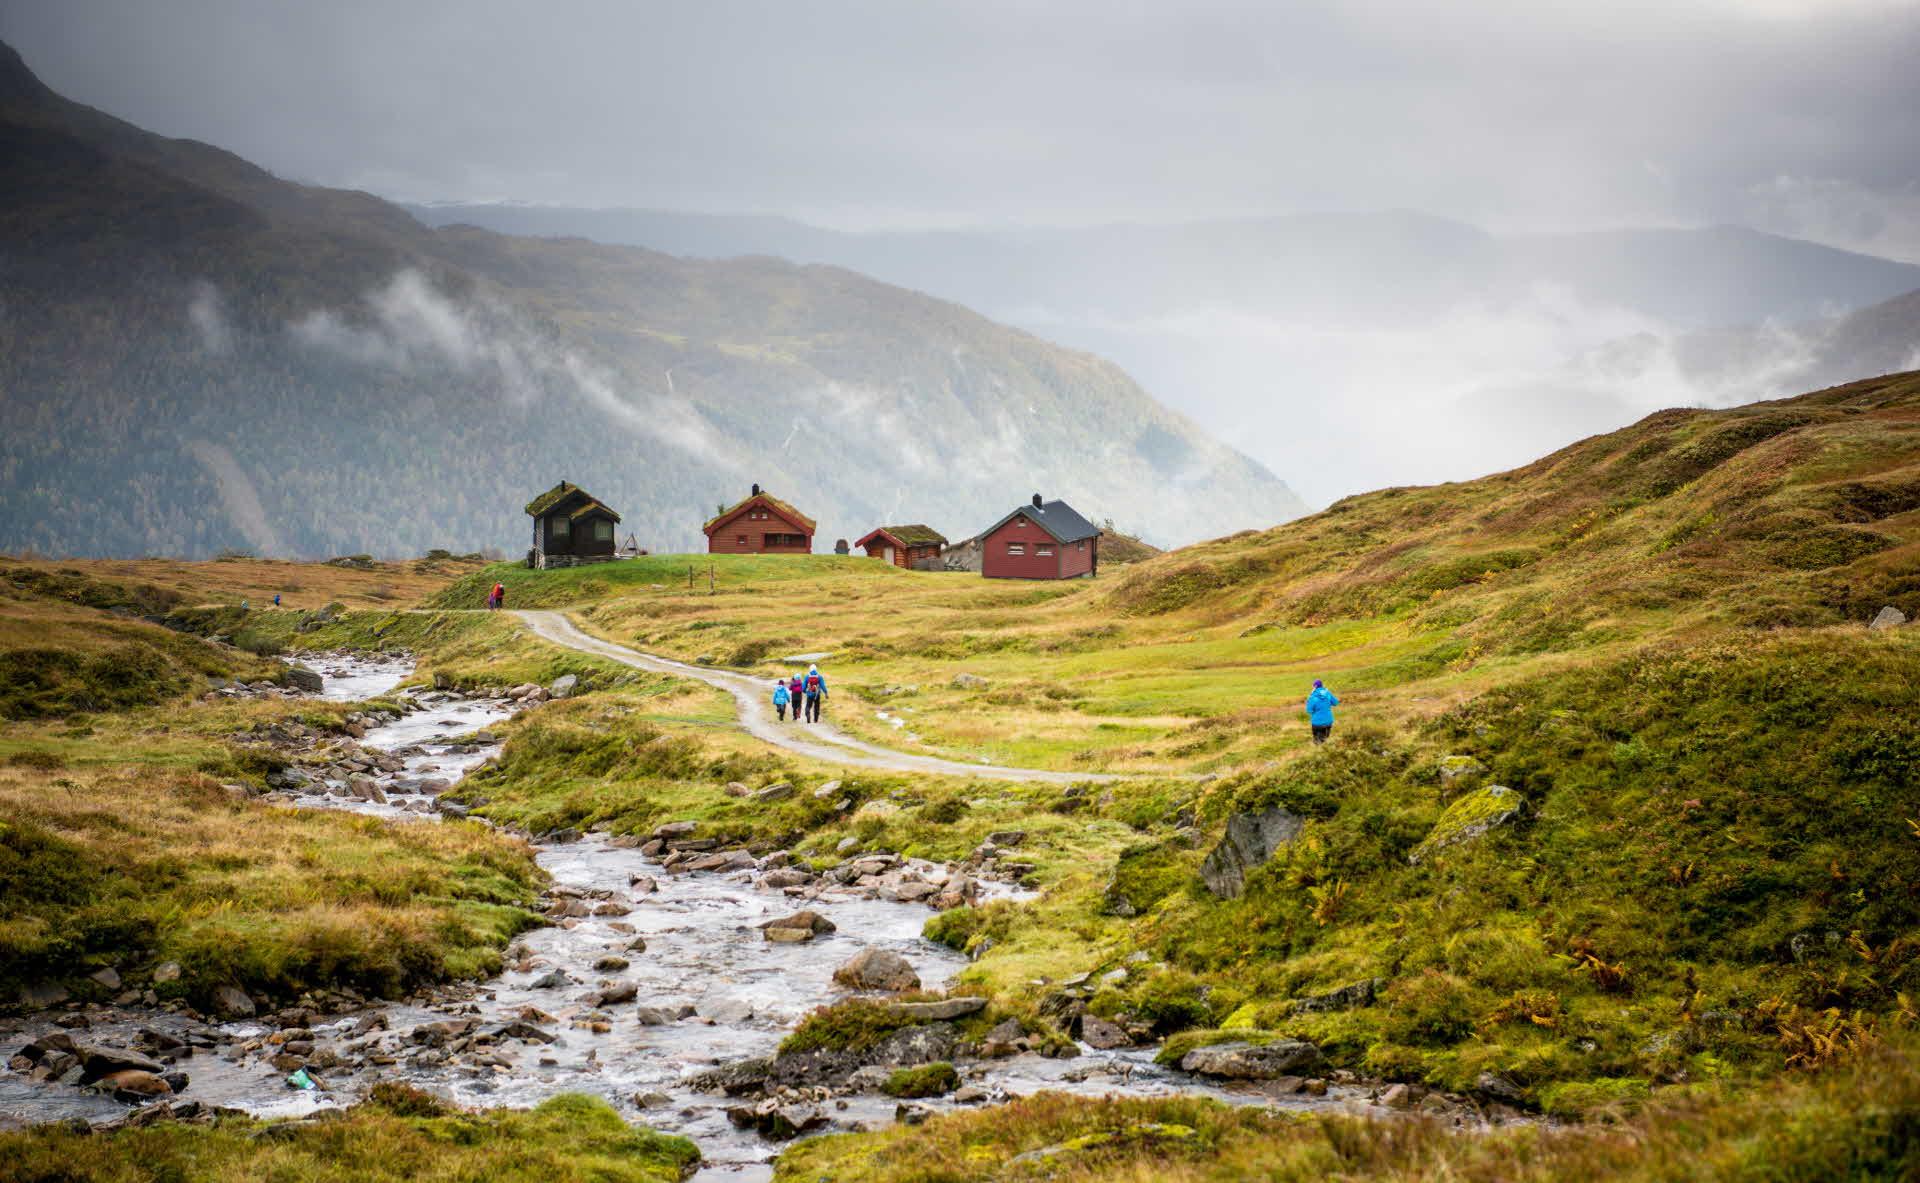 En gruppe vandrere går mot Mørkvesstølen i regnvær